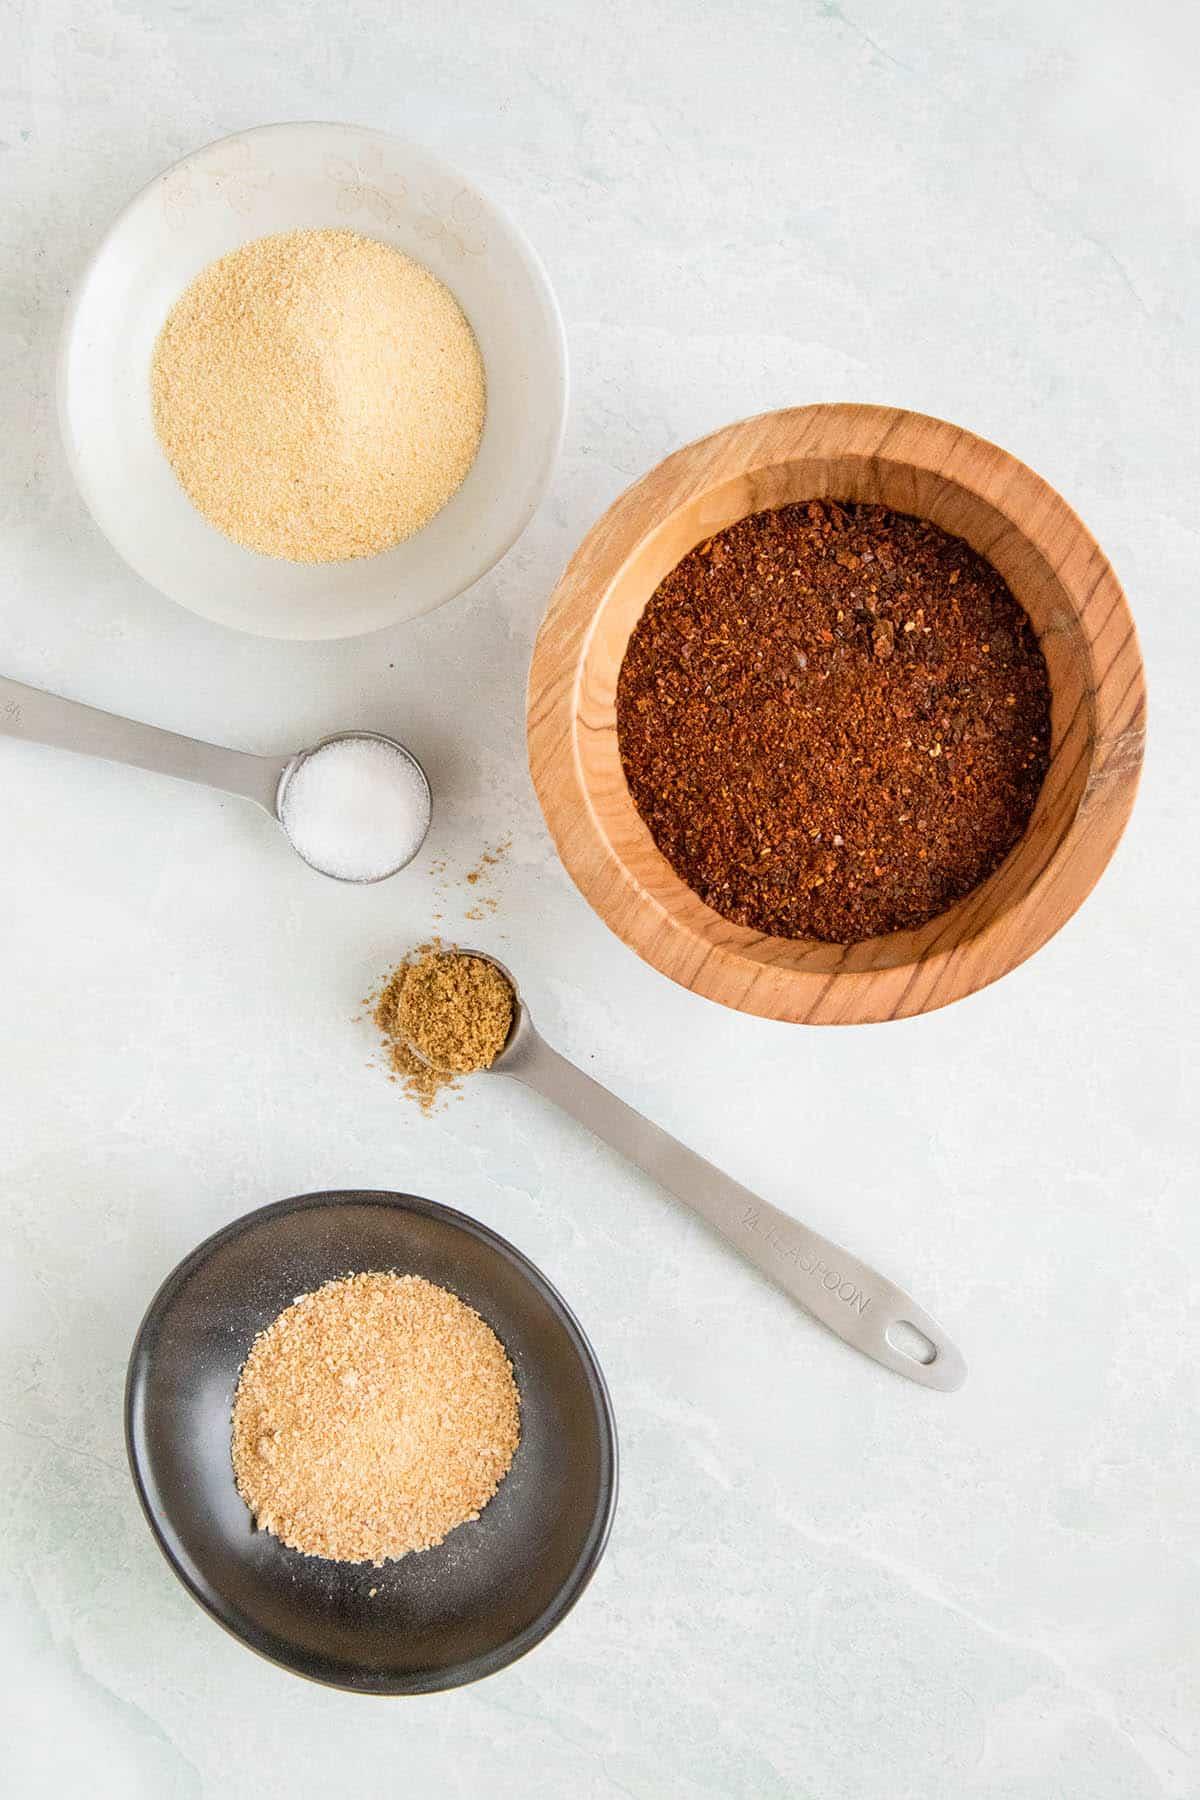 Homemade Chili Powder - Ingredients